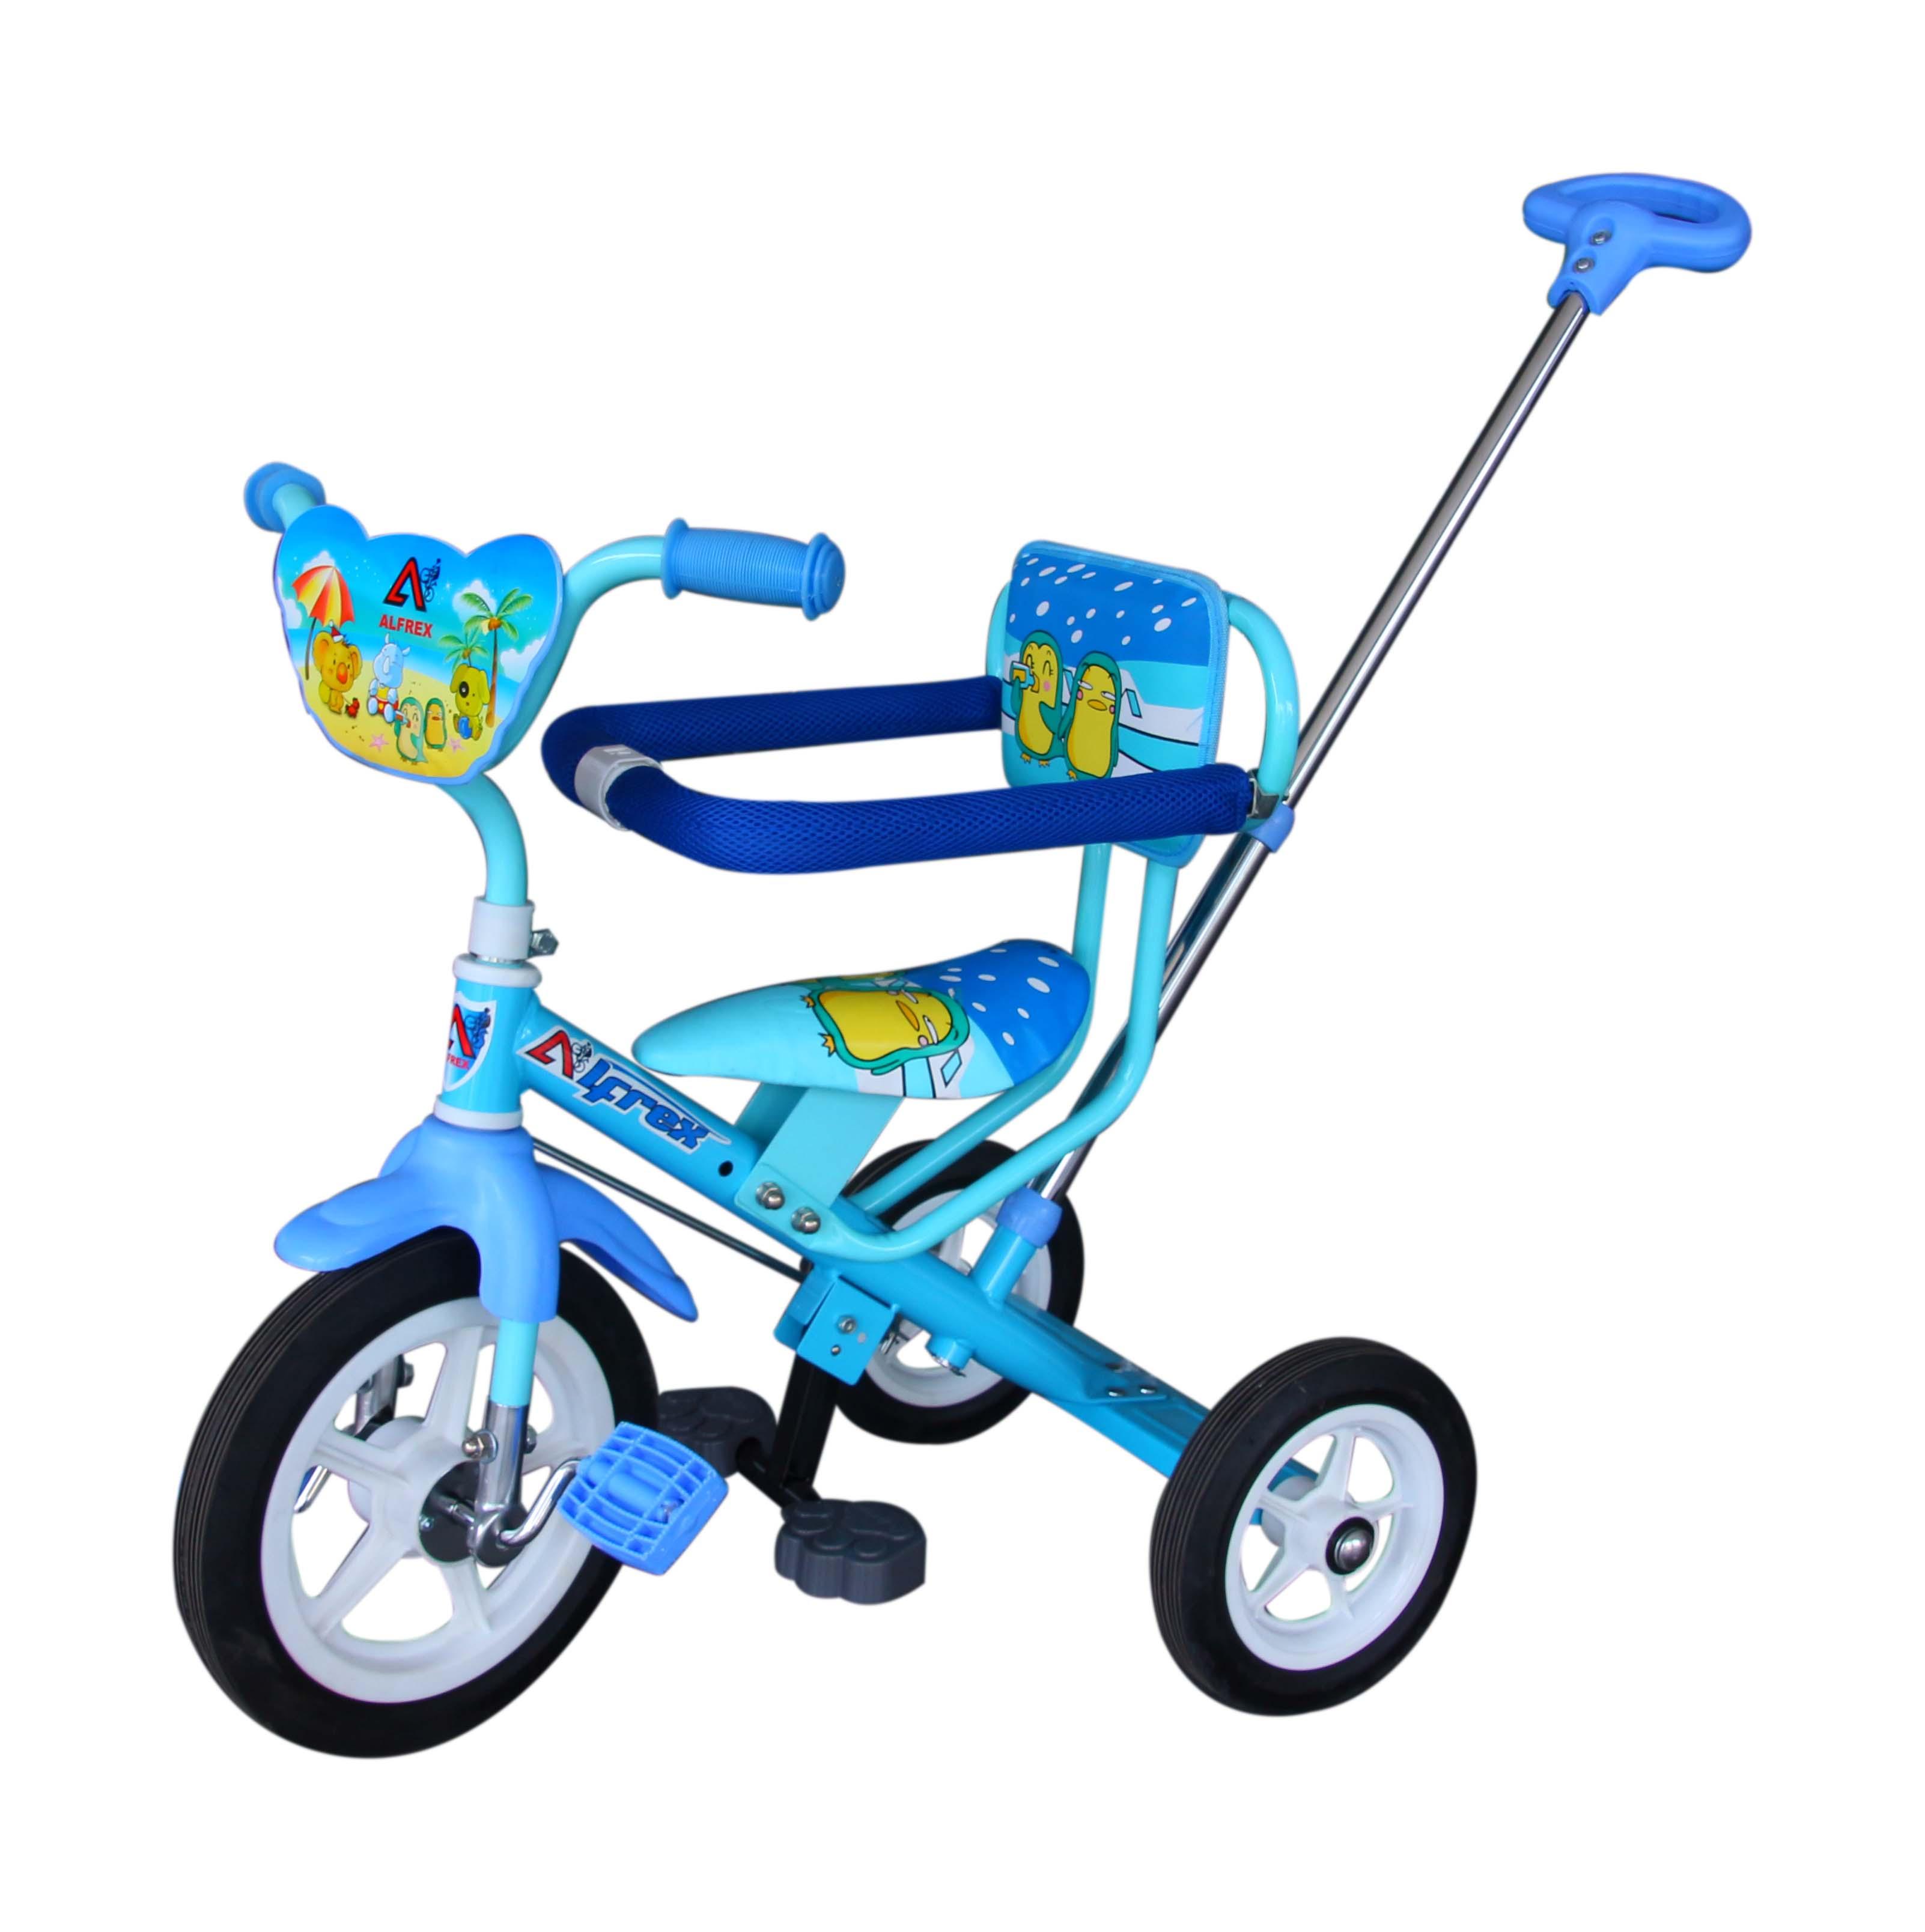 Jual Sepeda Roda Tiga Anak Terbaru Lazada Co Id